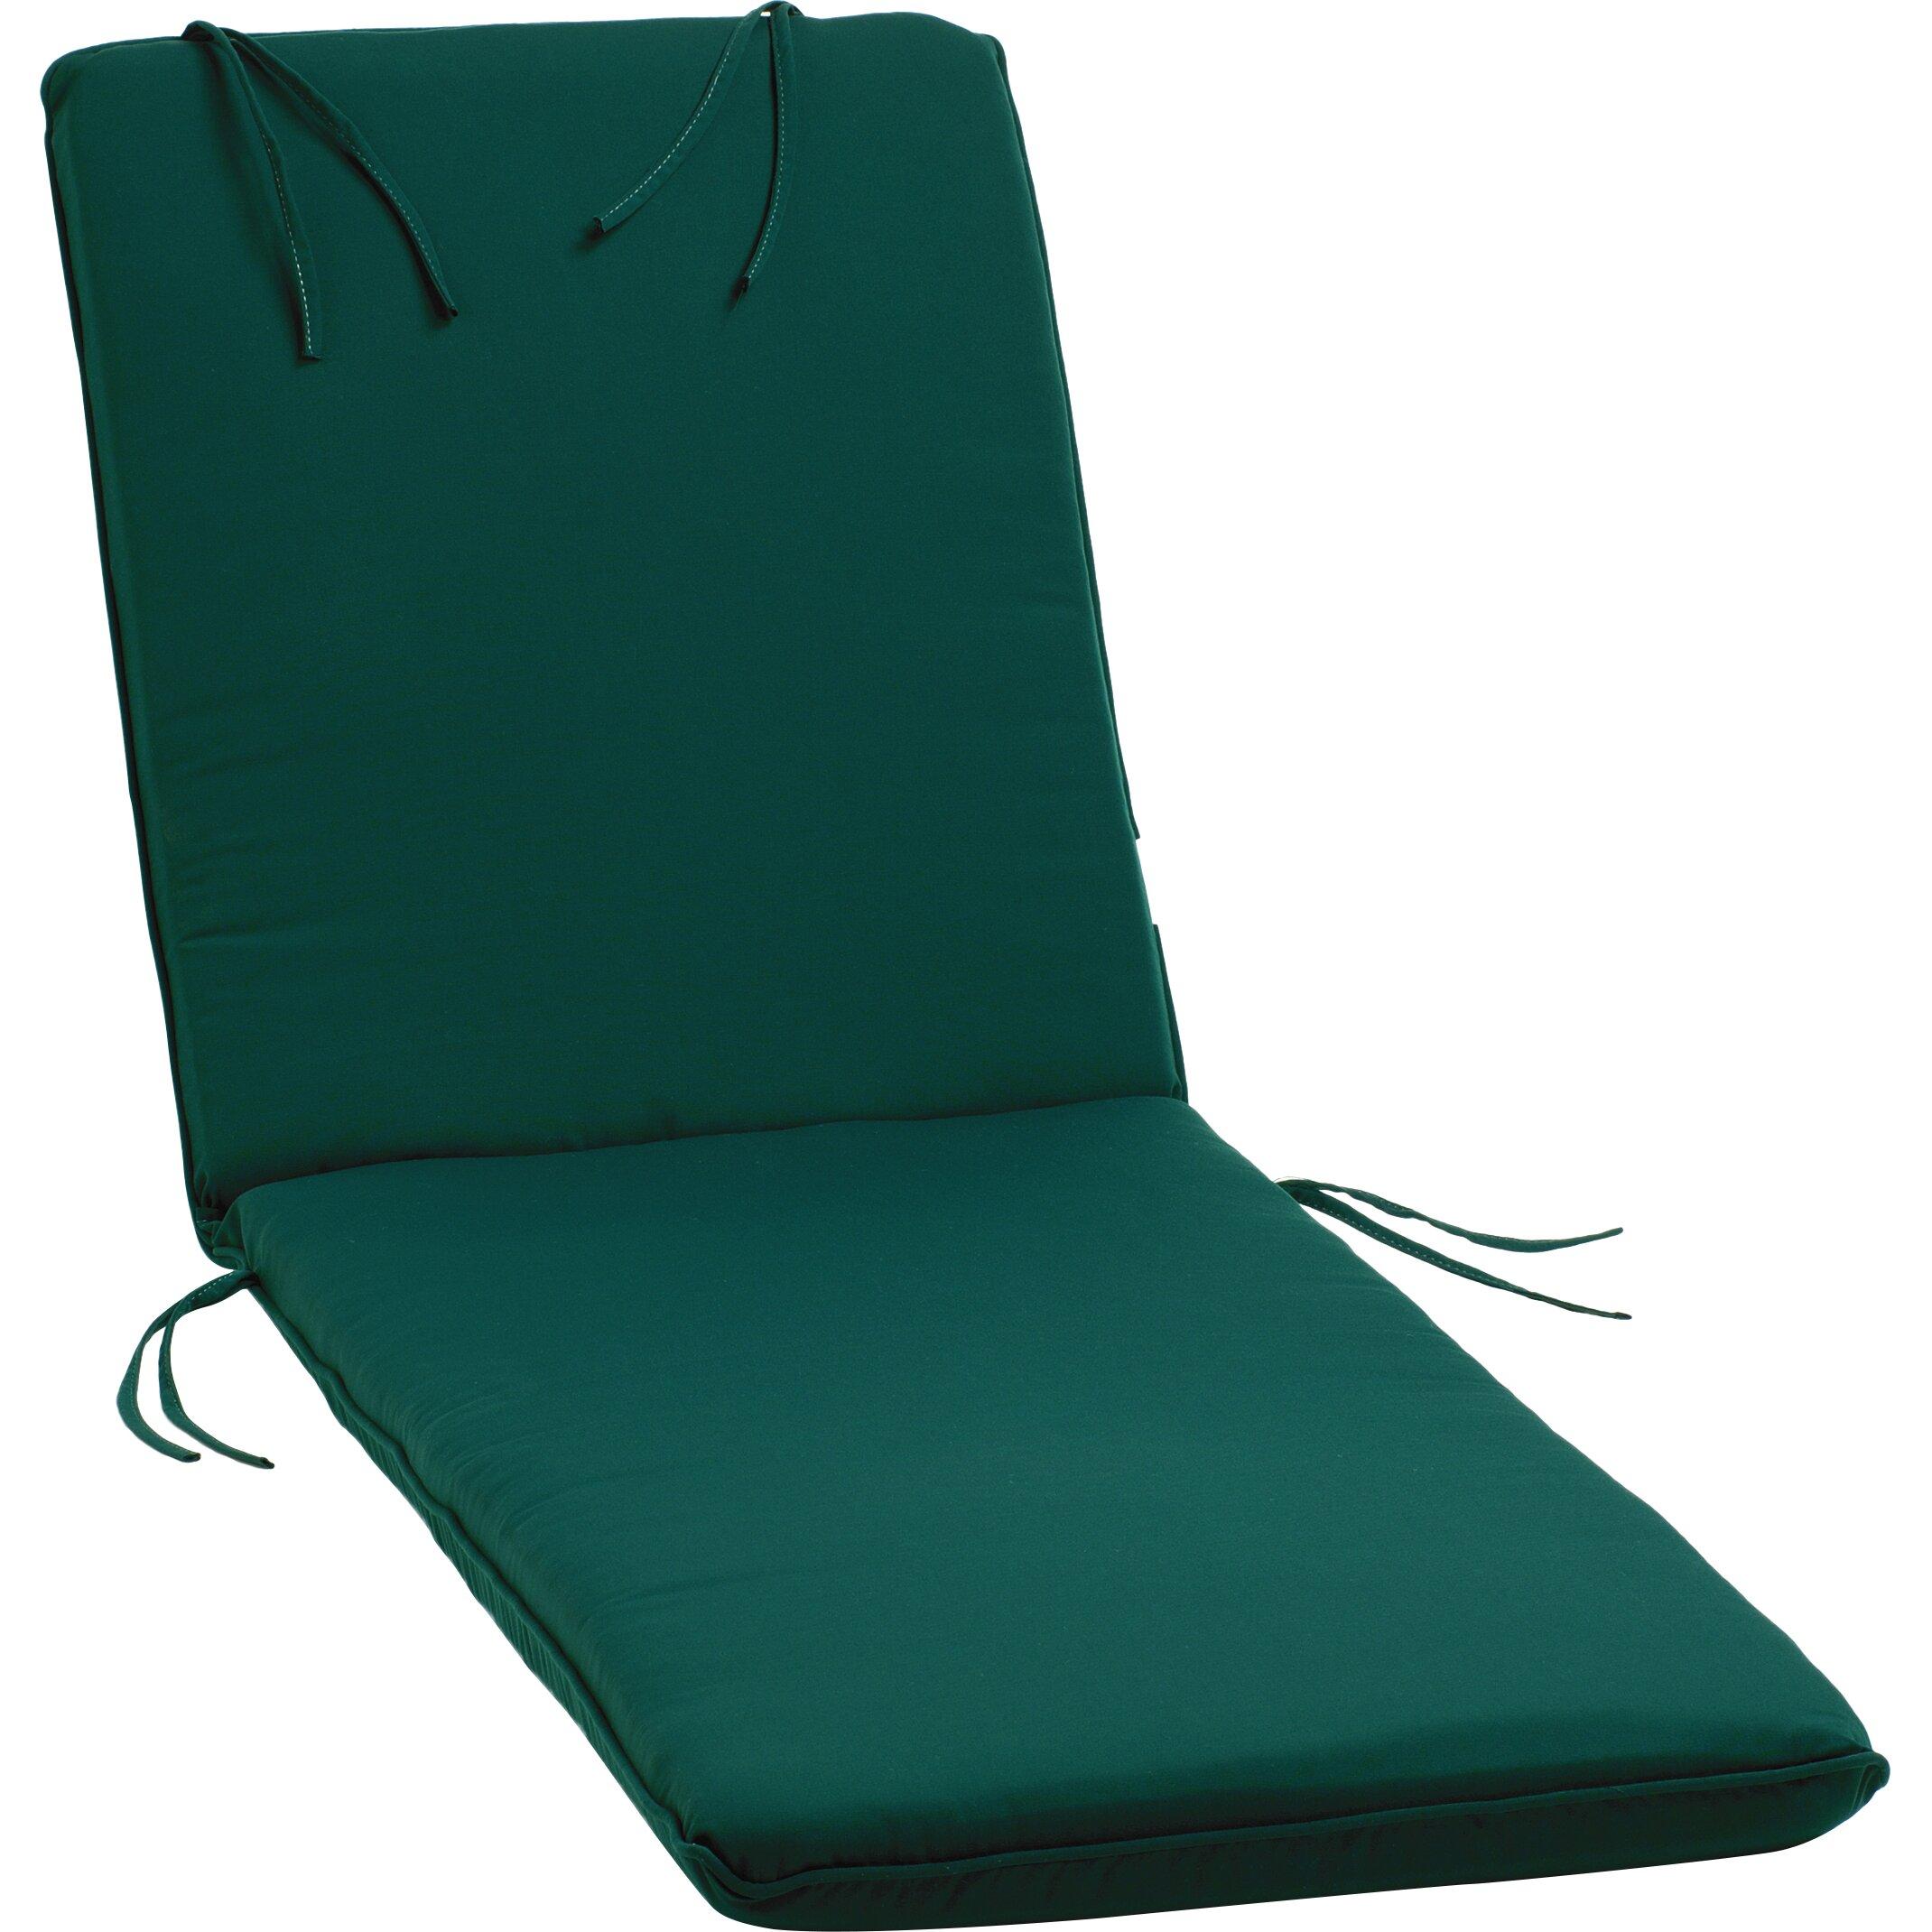 Oxford garden outdoor sunbrella chaise lounge cushion for Chaise cushions on sale